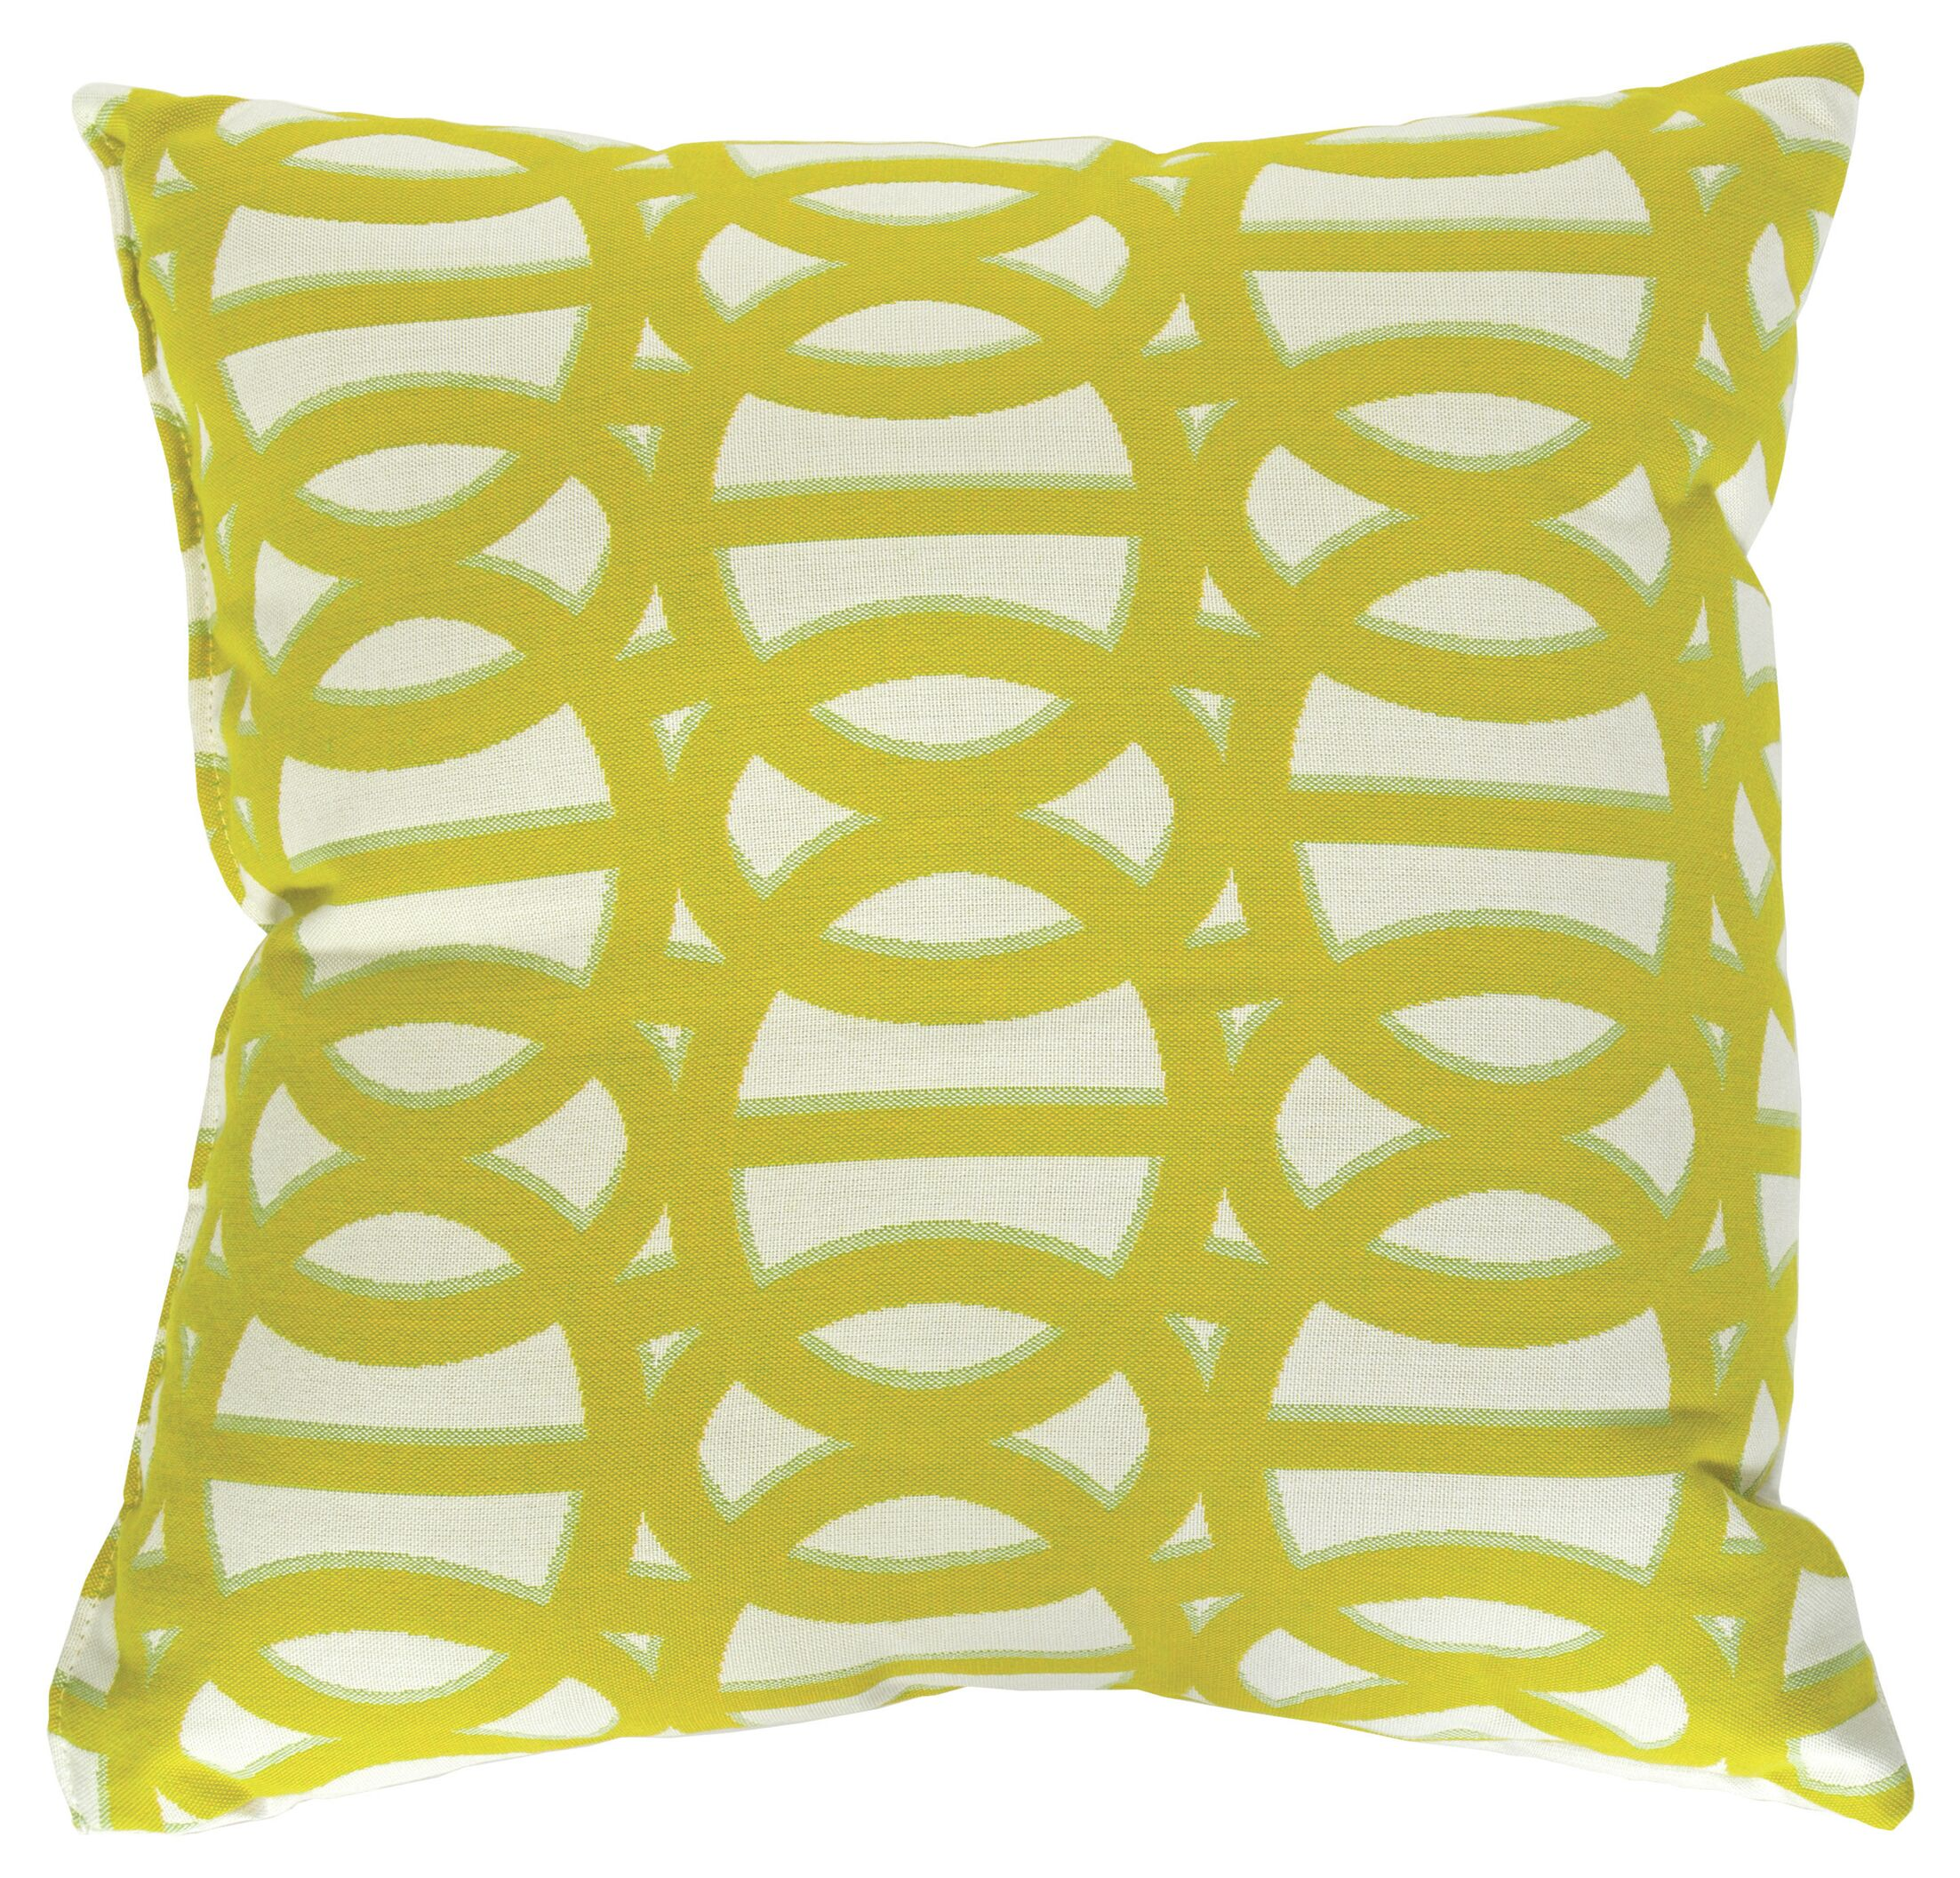 Eder Square Hammock Pillow